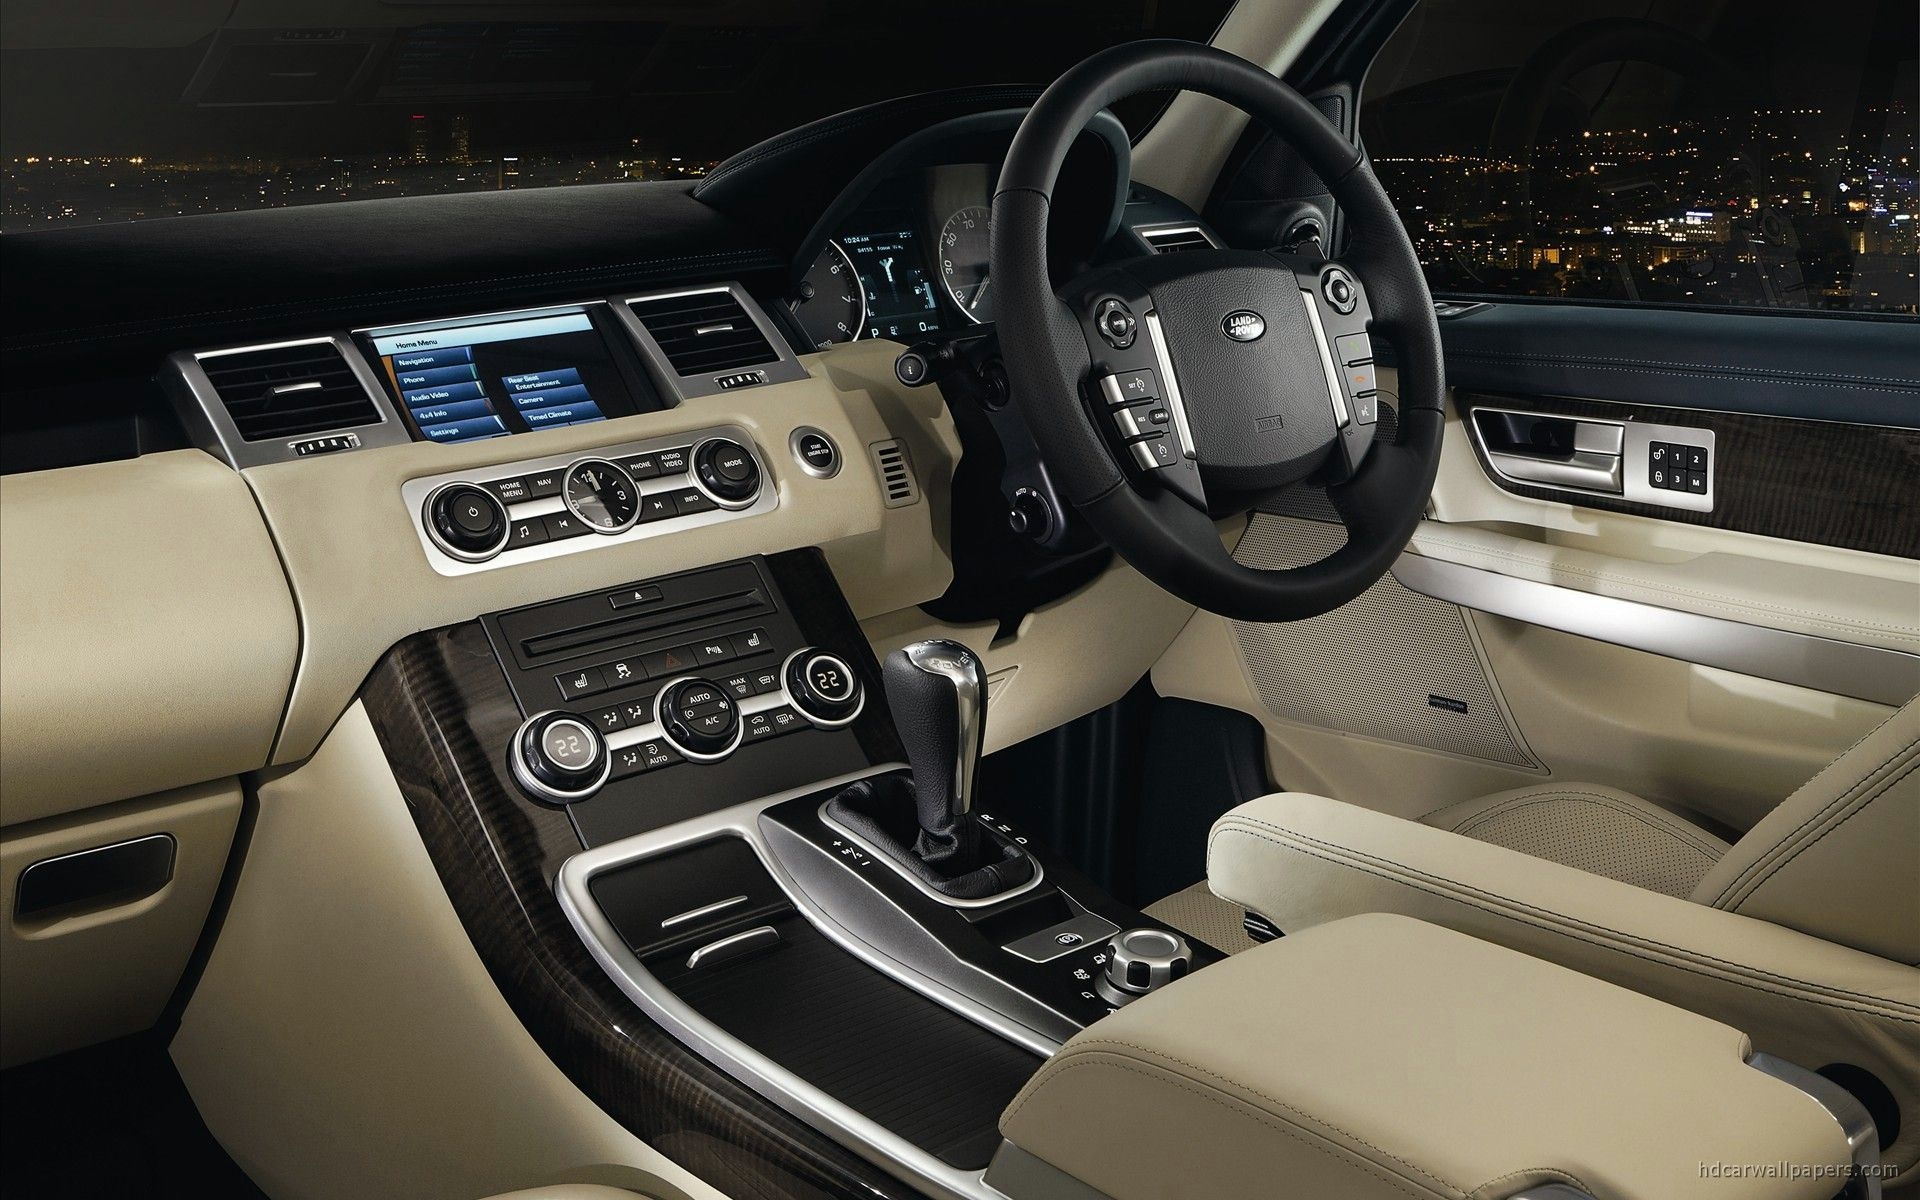 Reliable Car Parts Shop Sharjah Range Rover Range Rover Sport Range Rover Car